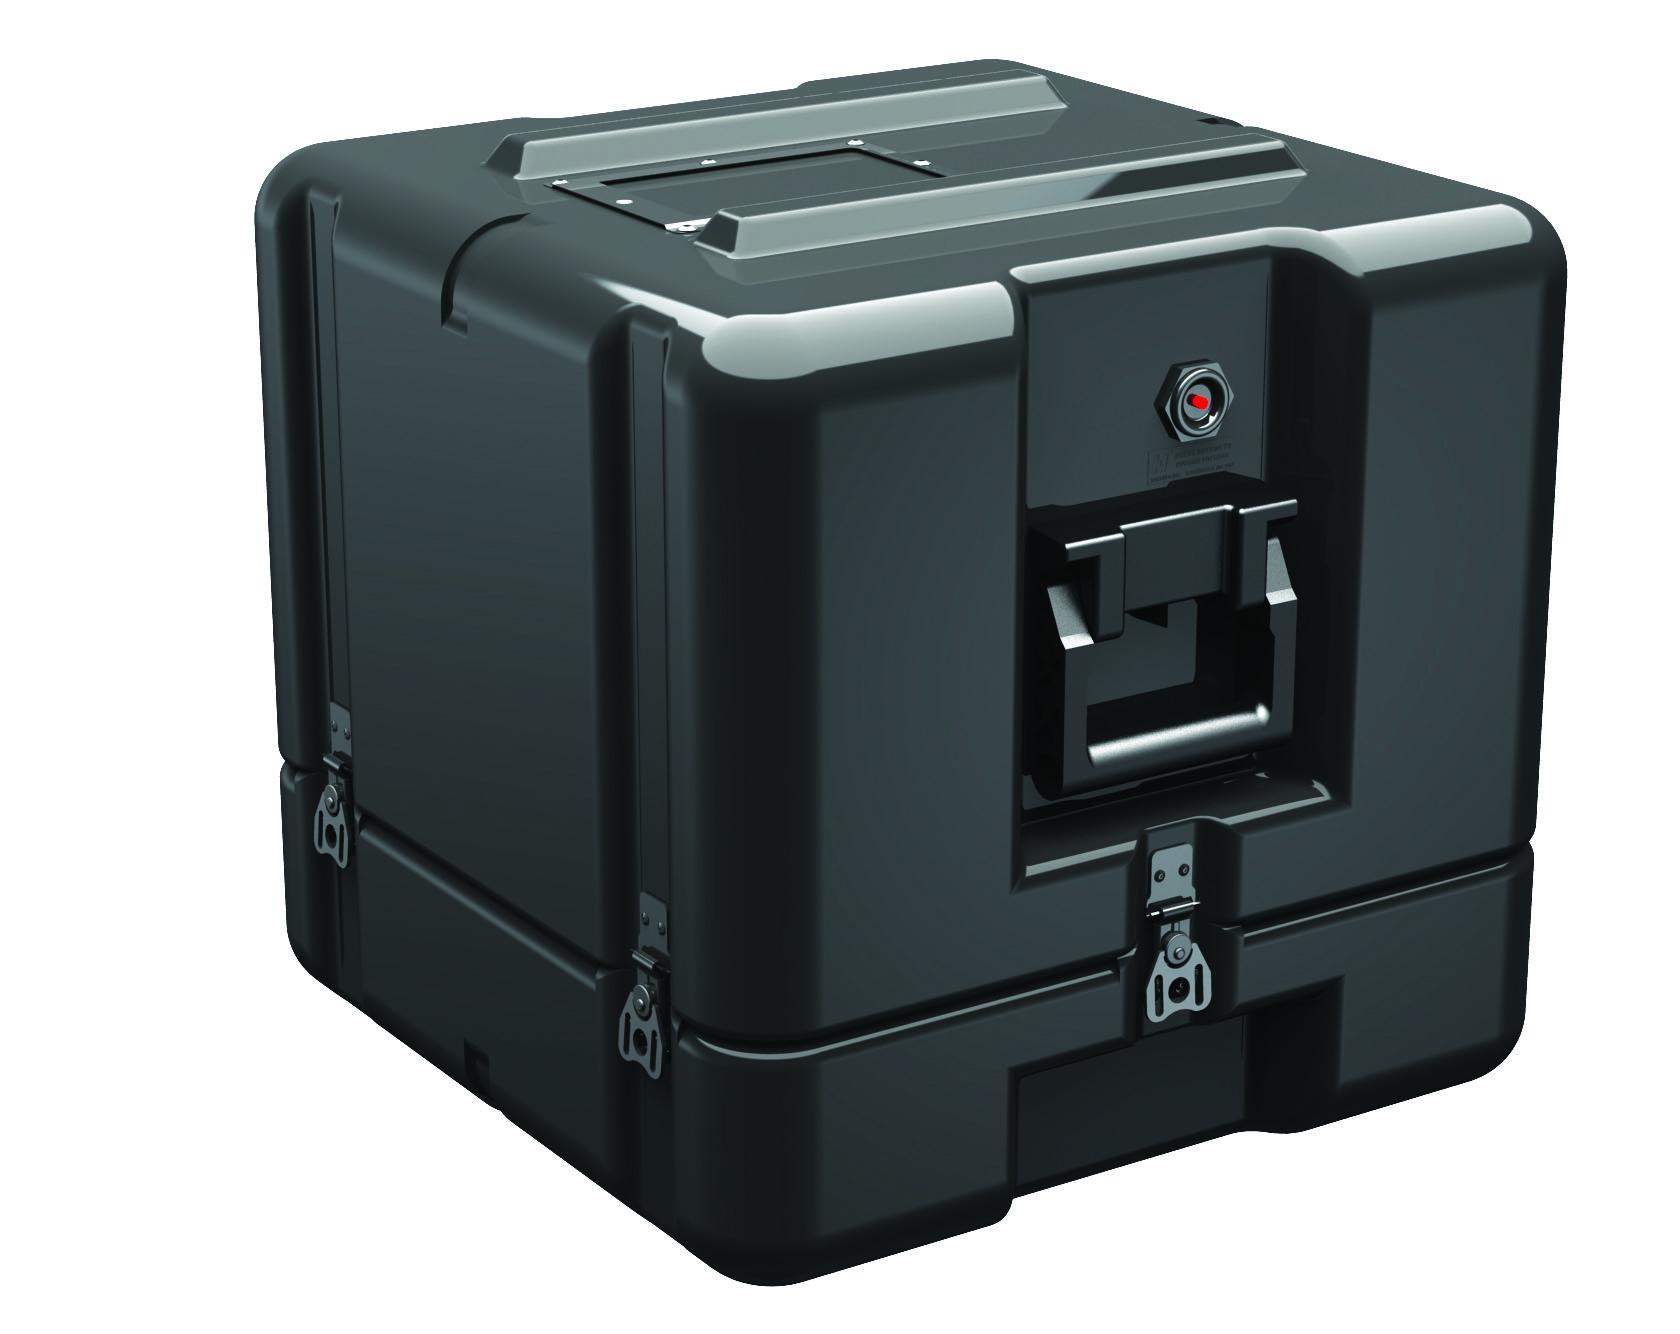 AL1616-0412 - AL1616-0412 Cube Computer Case SIngle Lid